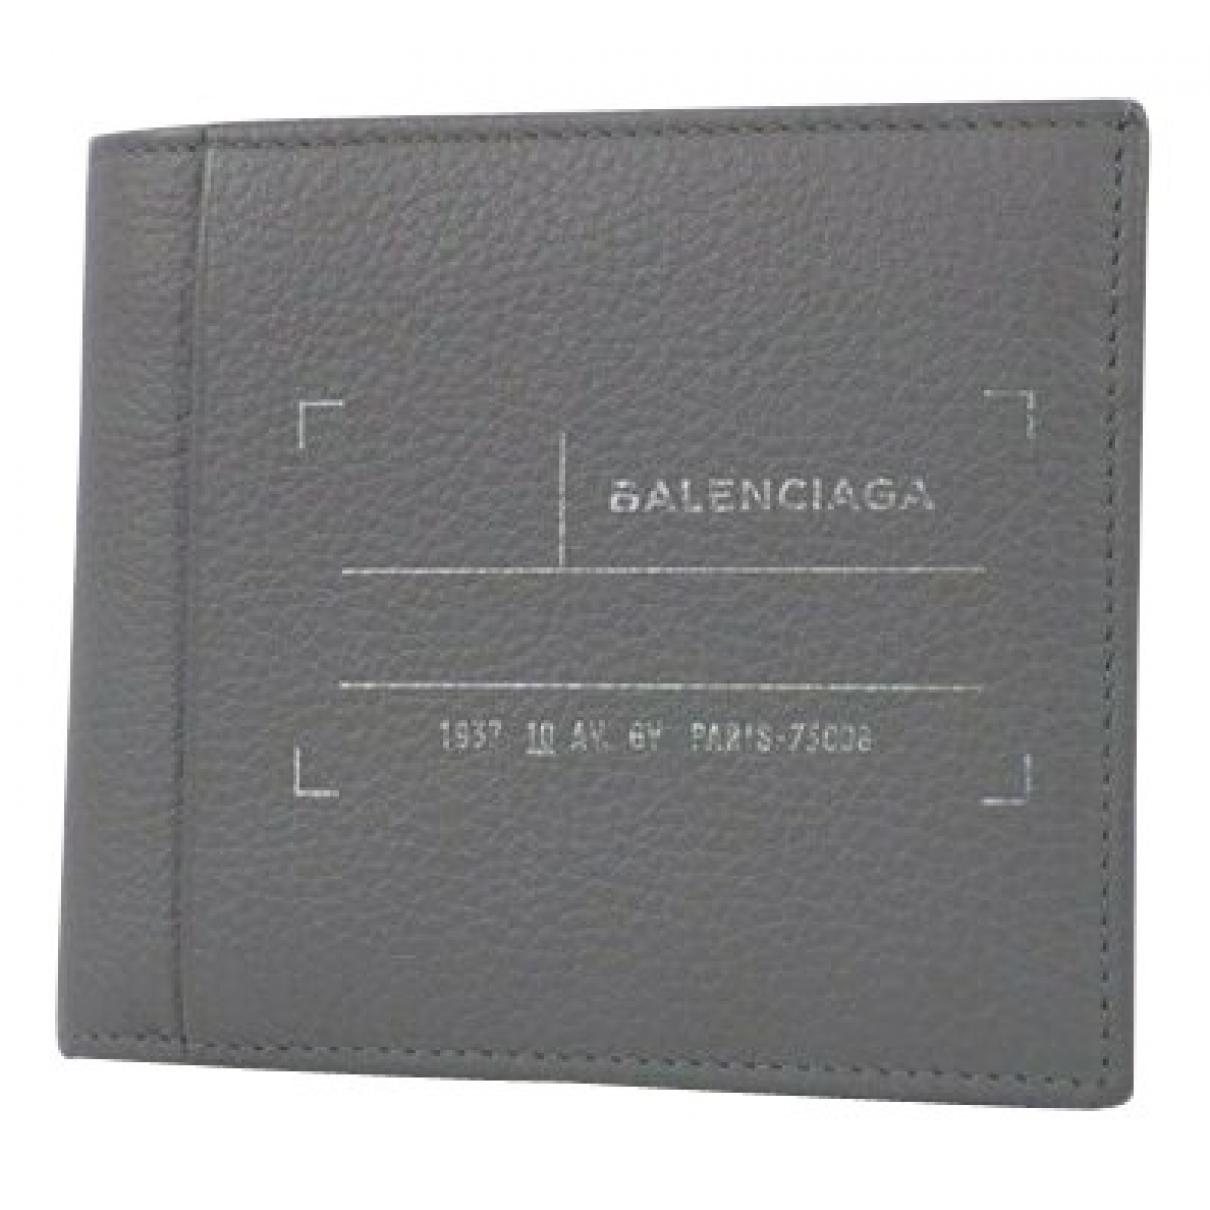 Balenciaga - Portefeuille   pour femme en cuir - gris